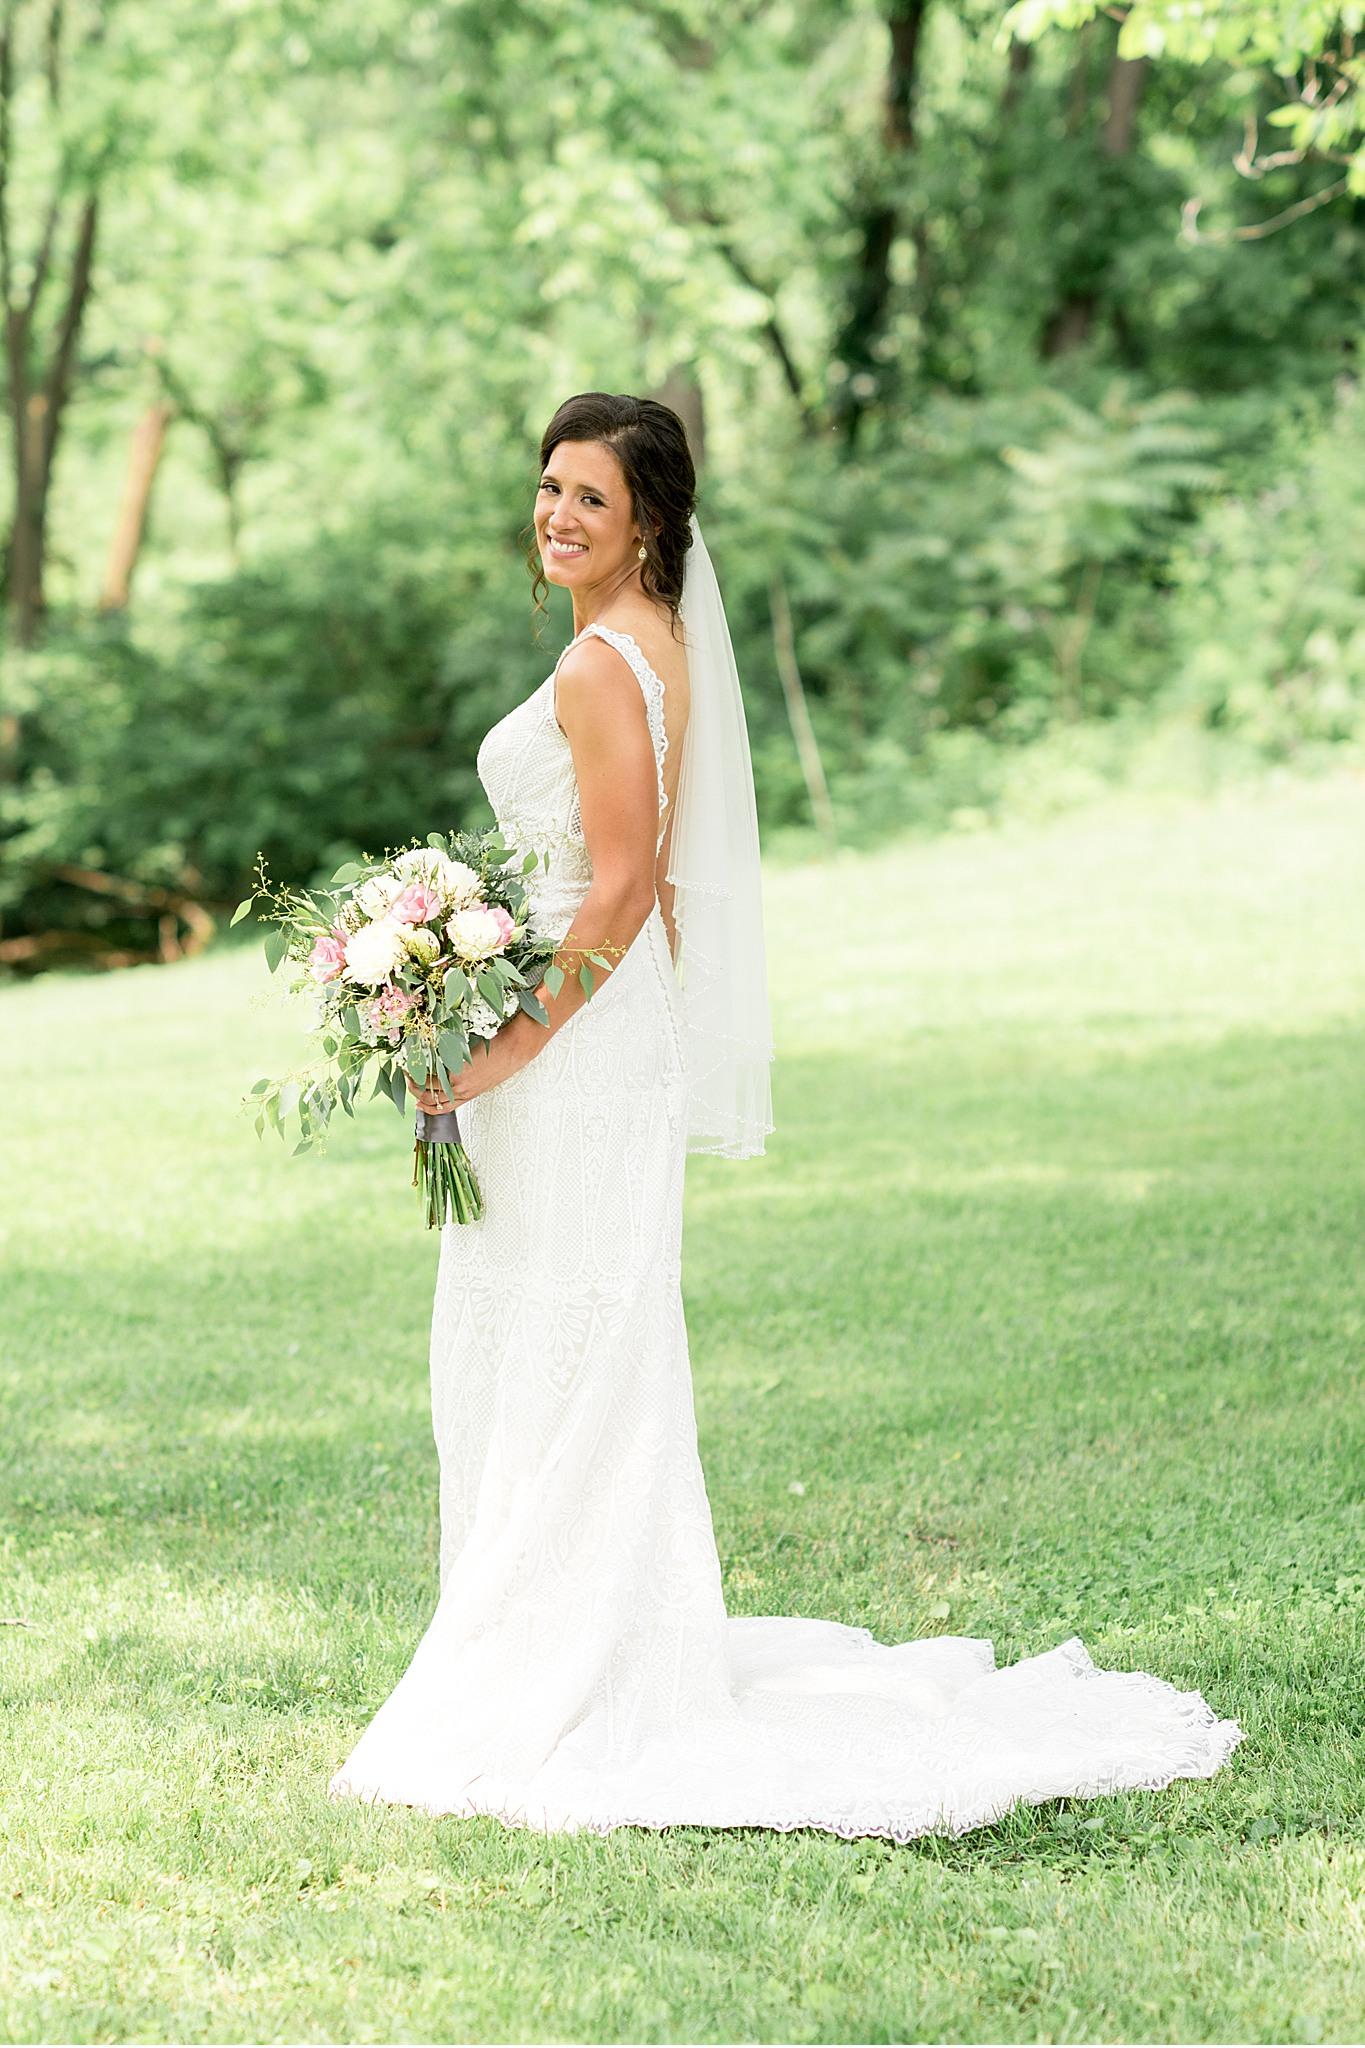 Simmontown wedding Barn Lancaster PA wedding engagement Photography_3585.jpg